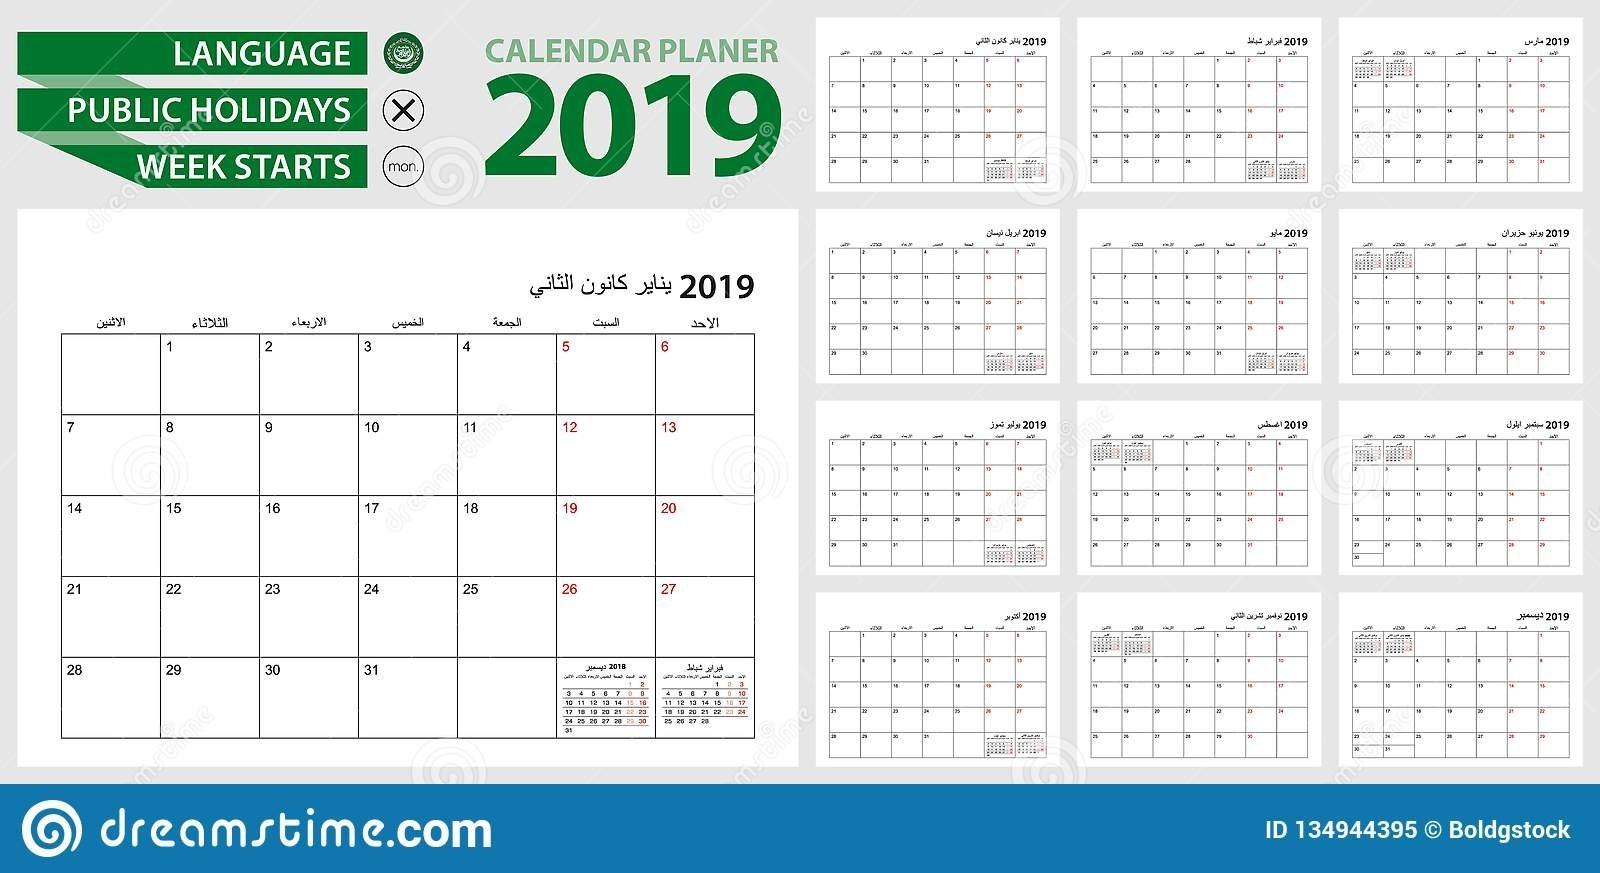 Arabic Calendar Planner For 2019. Arabic Language, Week-January 2020 Arabic Calendar